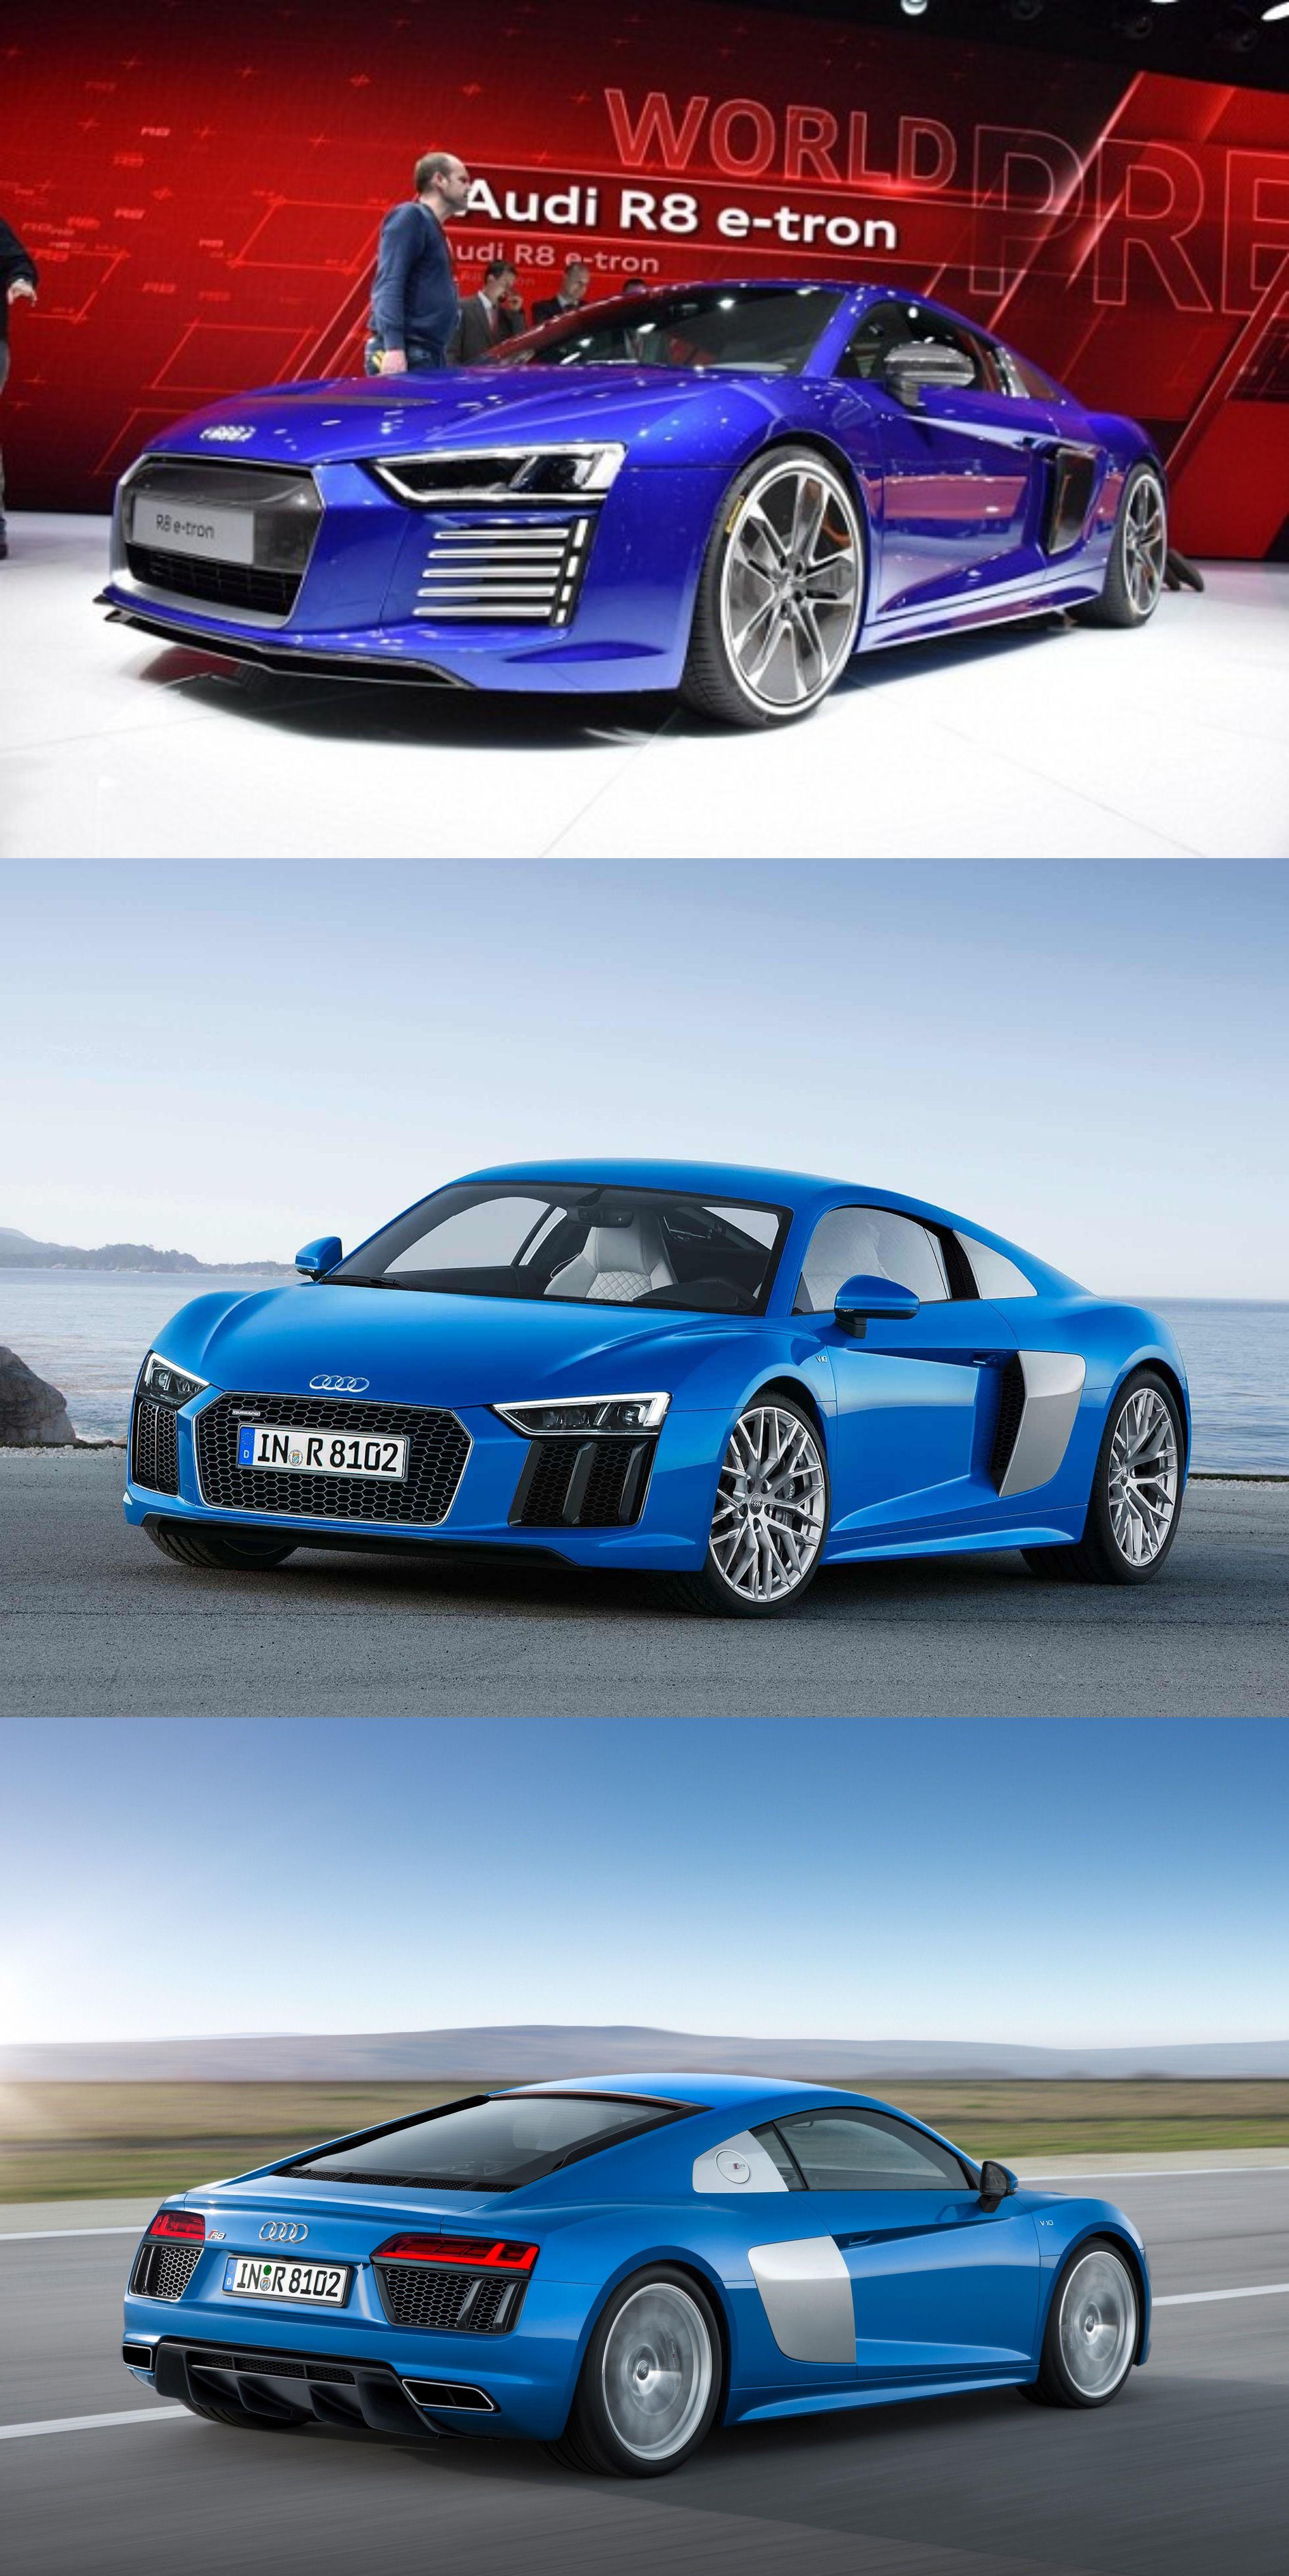 dd34b2f3991 Audi Unlatched its R8 e-tron Concept Model at CES Asia   Audi car's ...